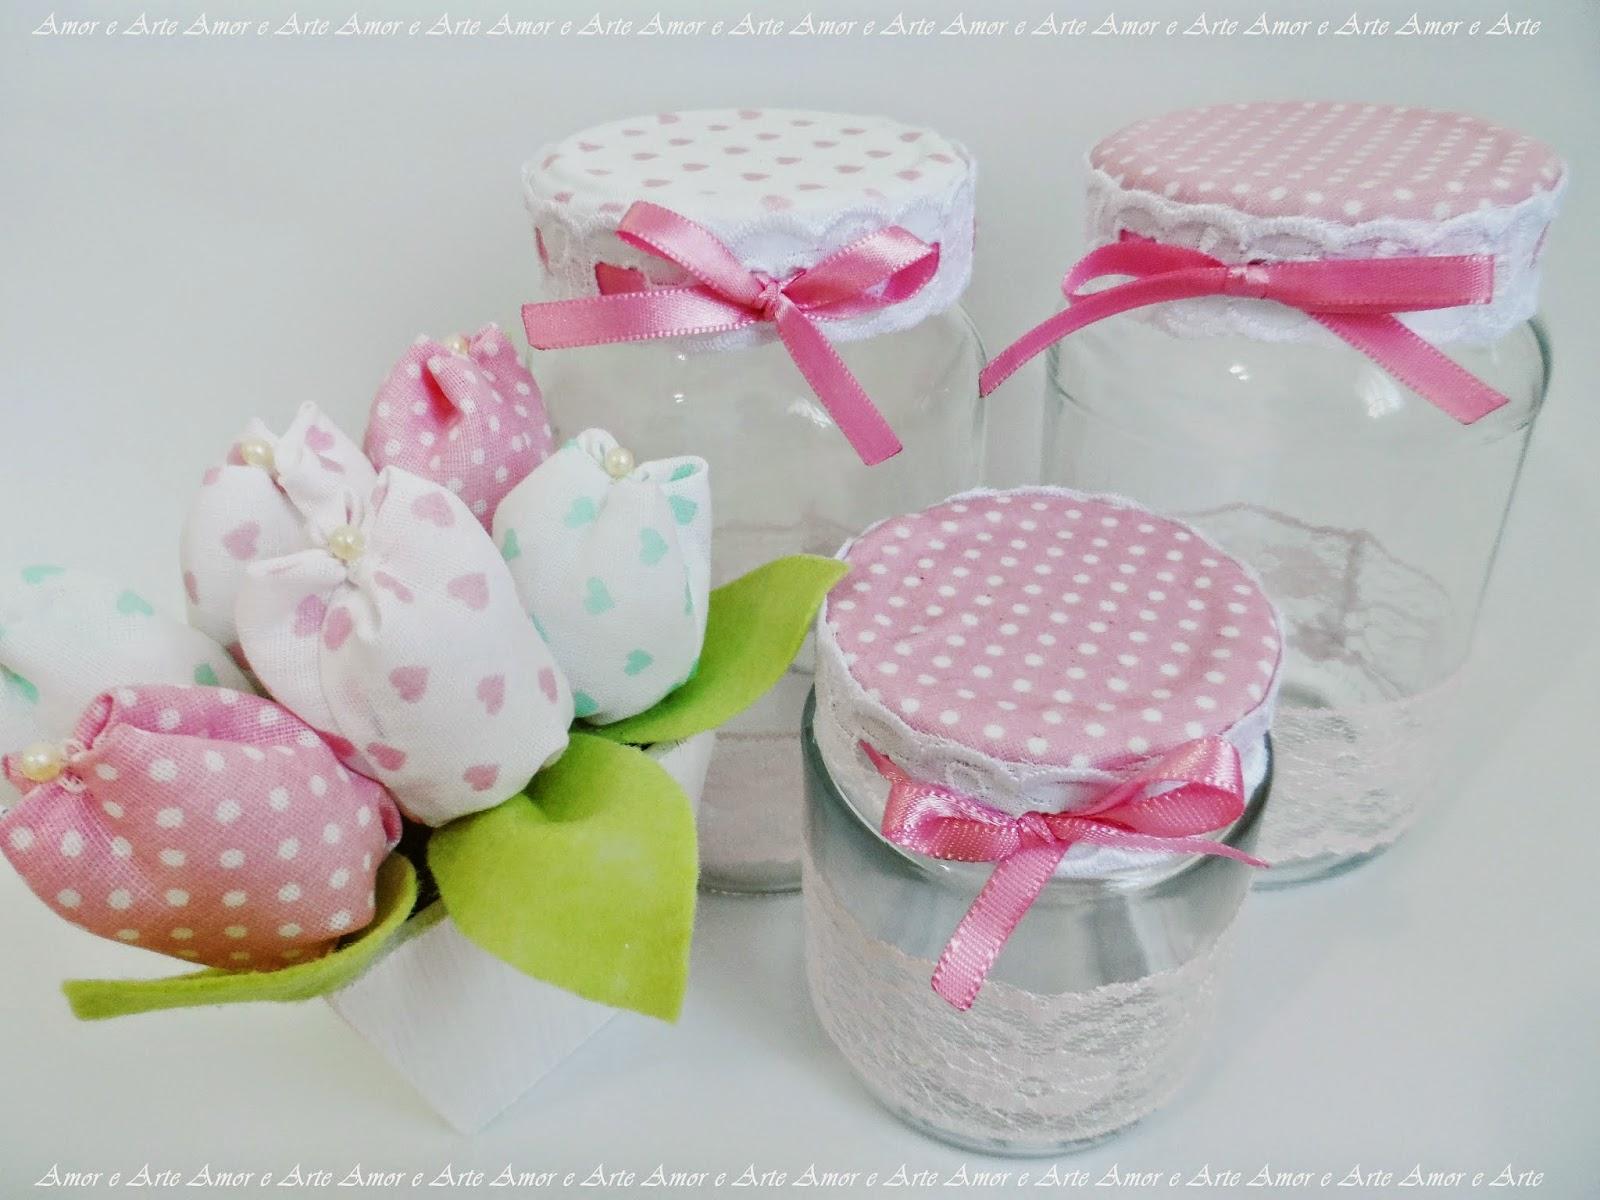 Vidros decorados - Kit Higiene, meninas